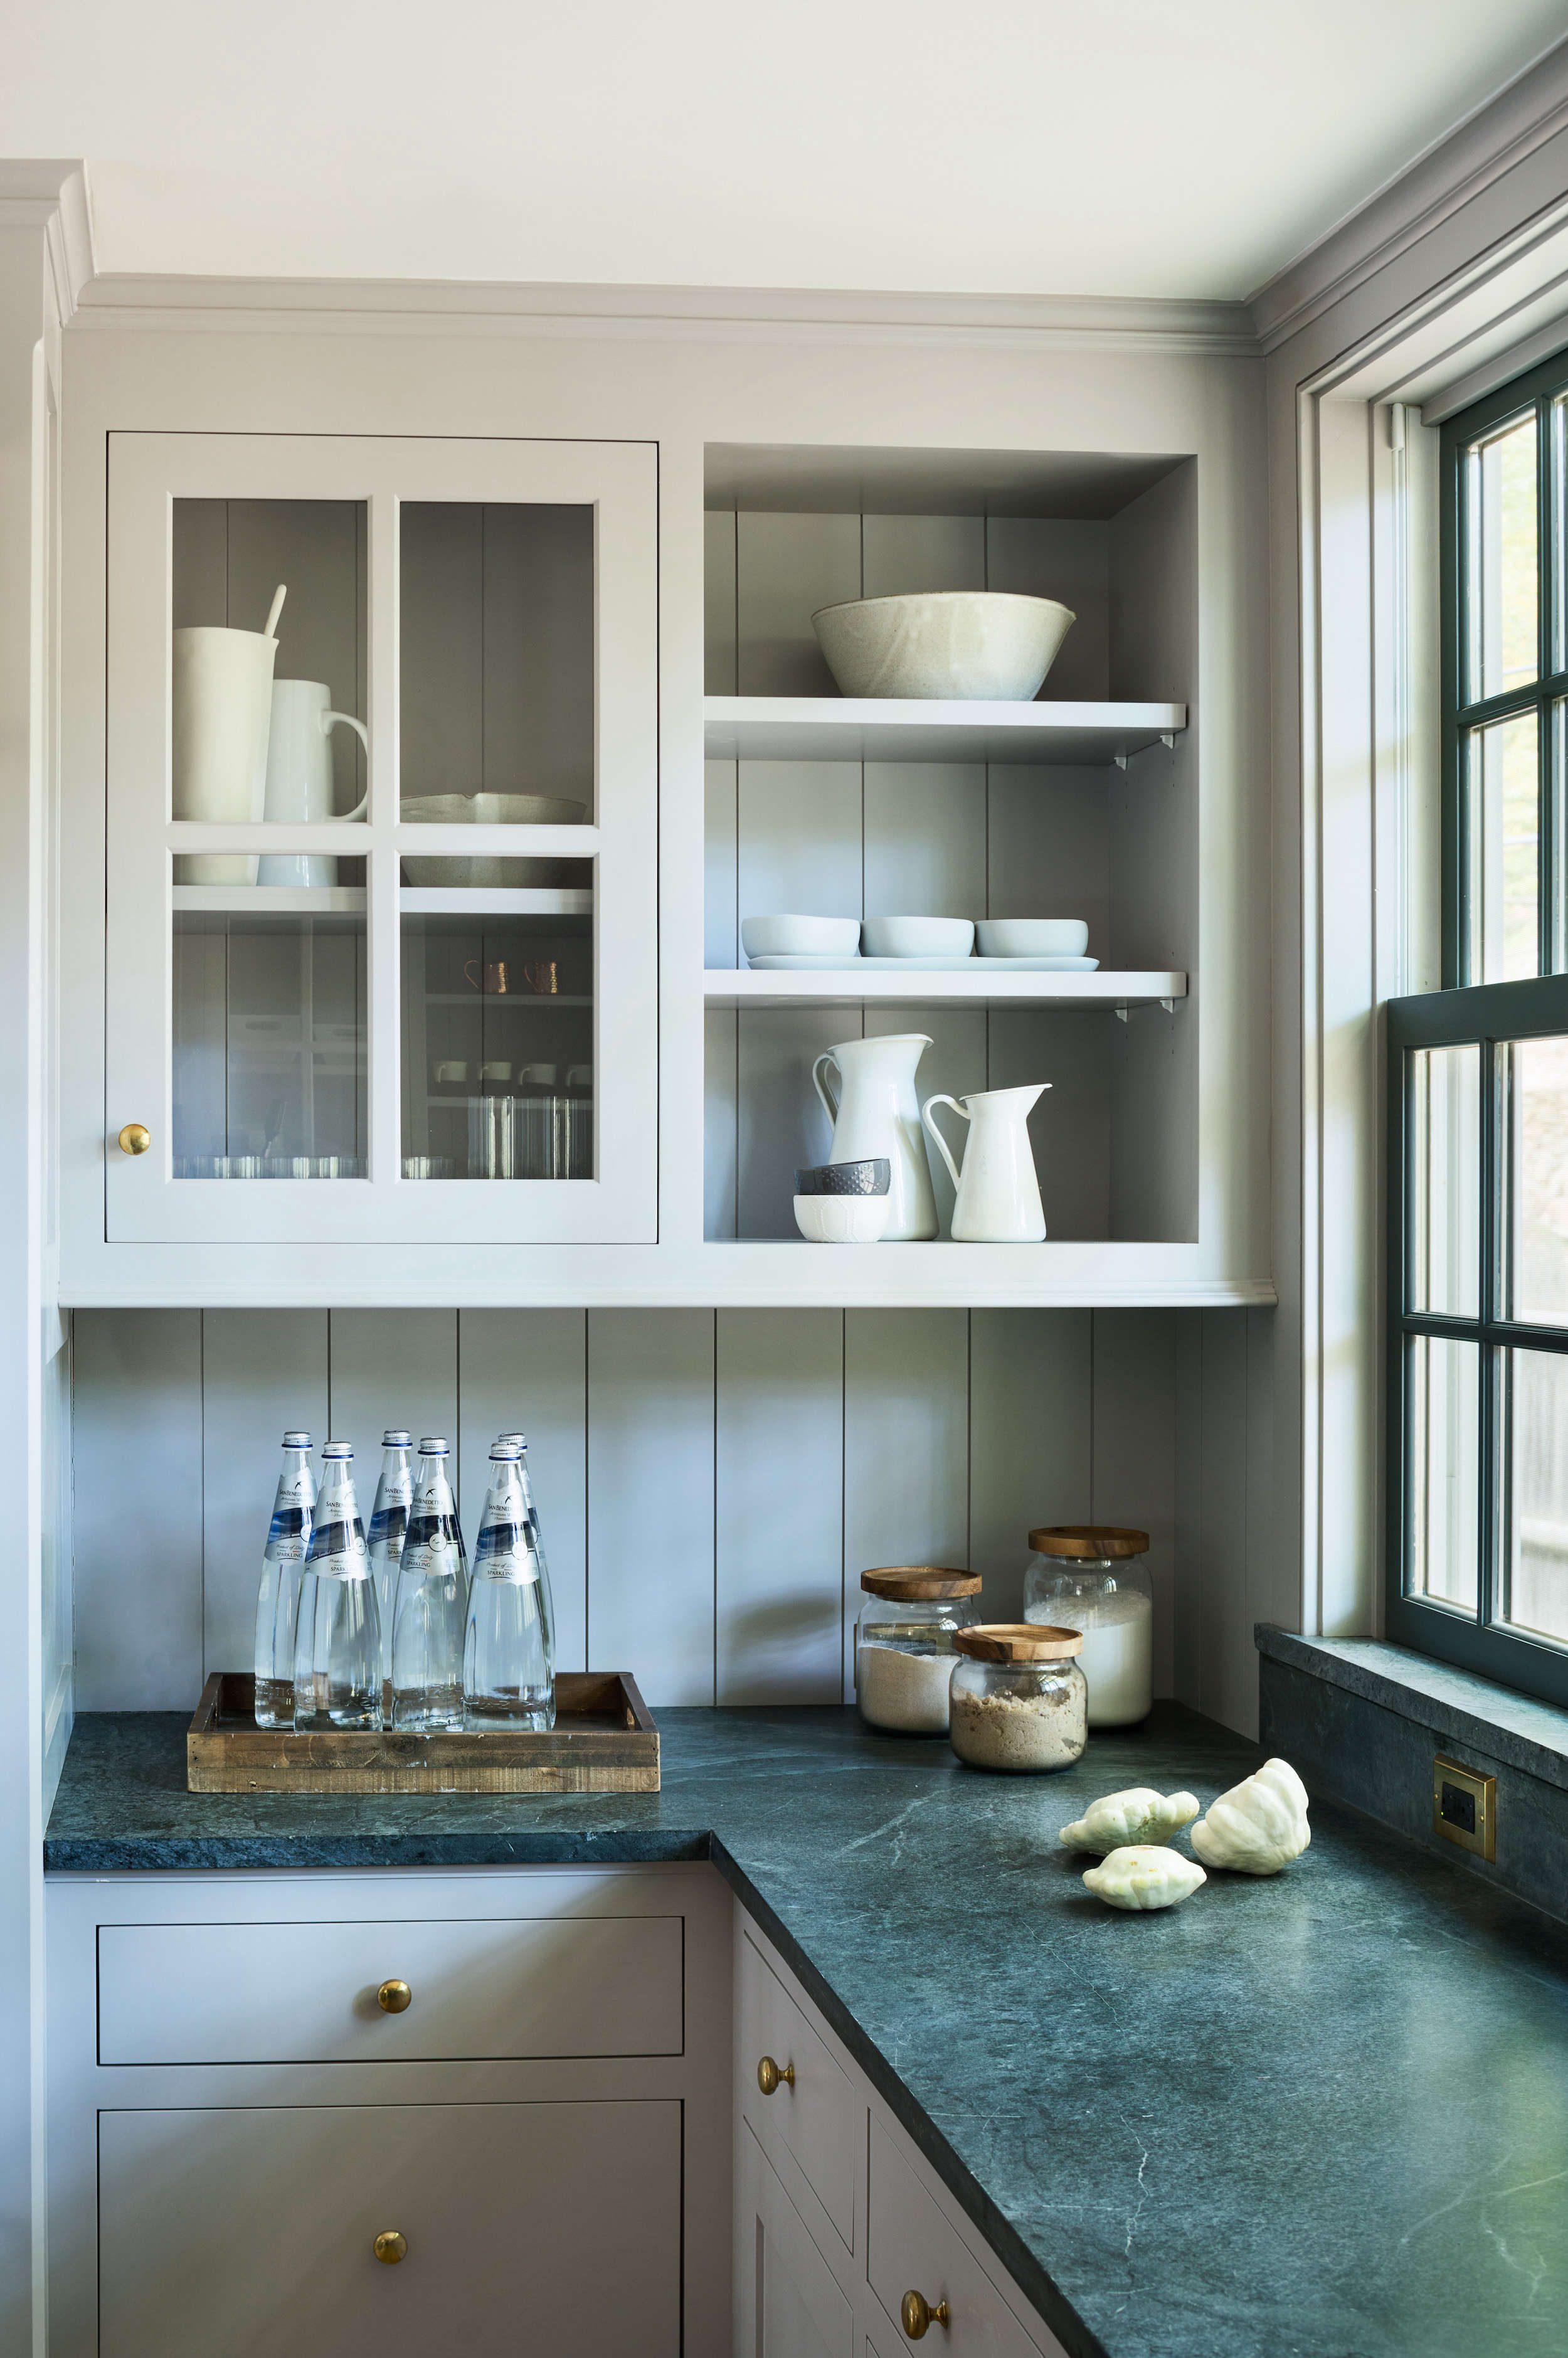 modern-farmhouse-kitchen-renovation-light-gray-cabinets-with-open-shelf-glass-front